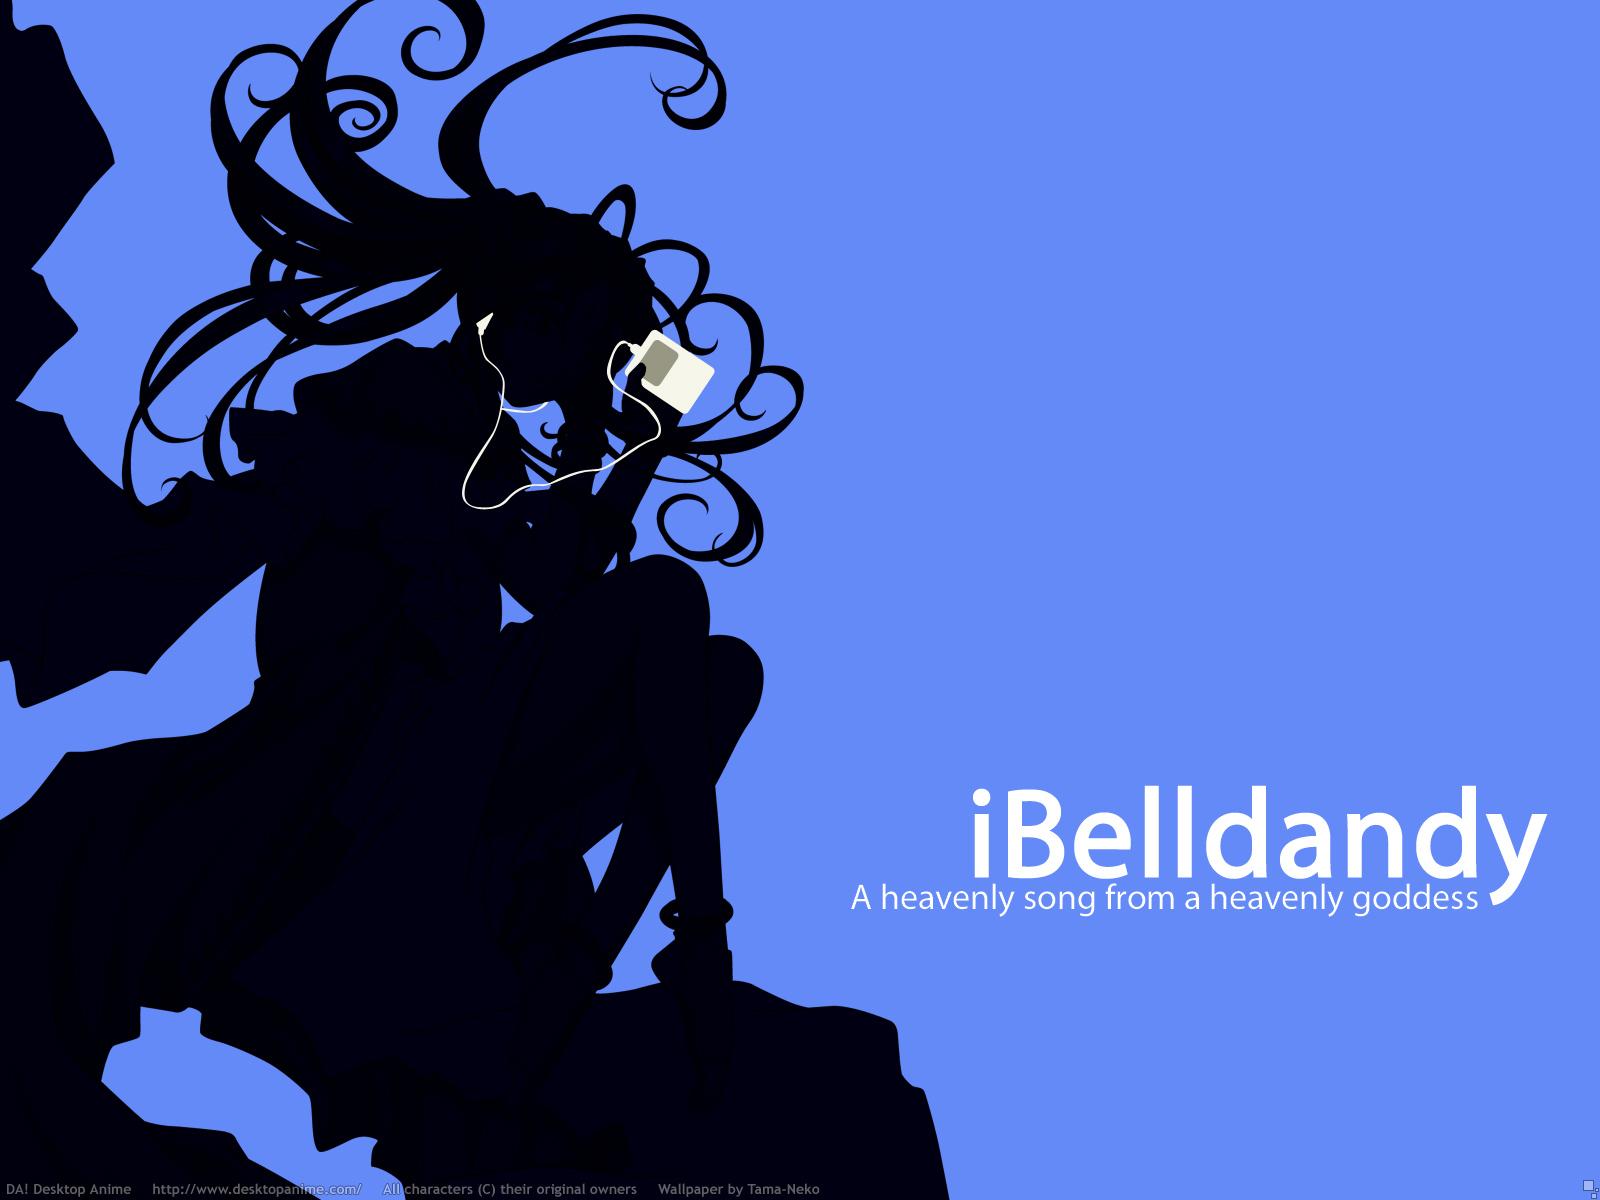 aa_megami-sama belldandy blue ipod polychromatic signed silhouette watermark